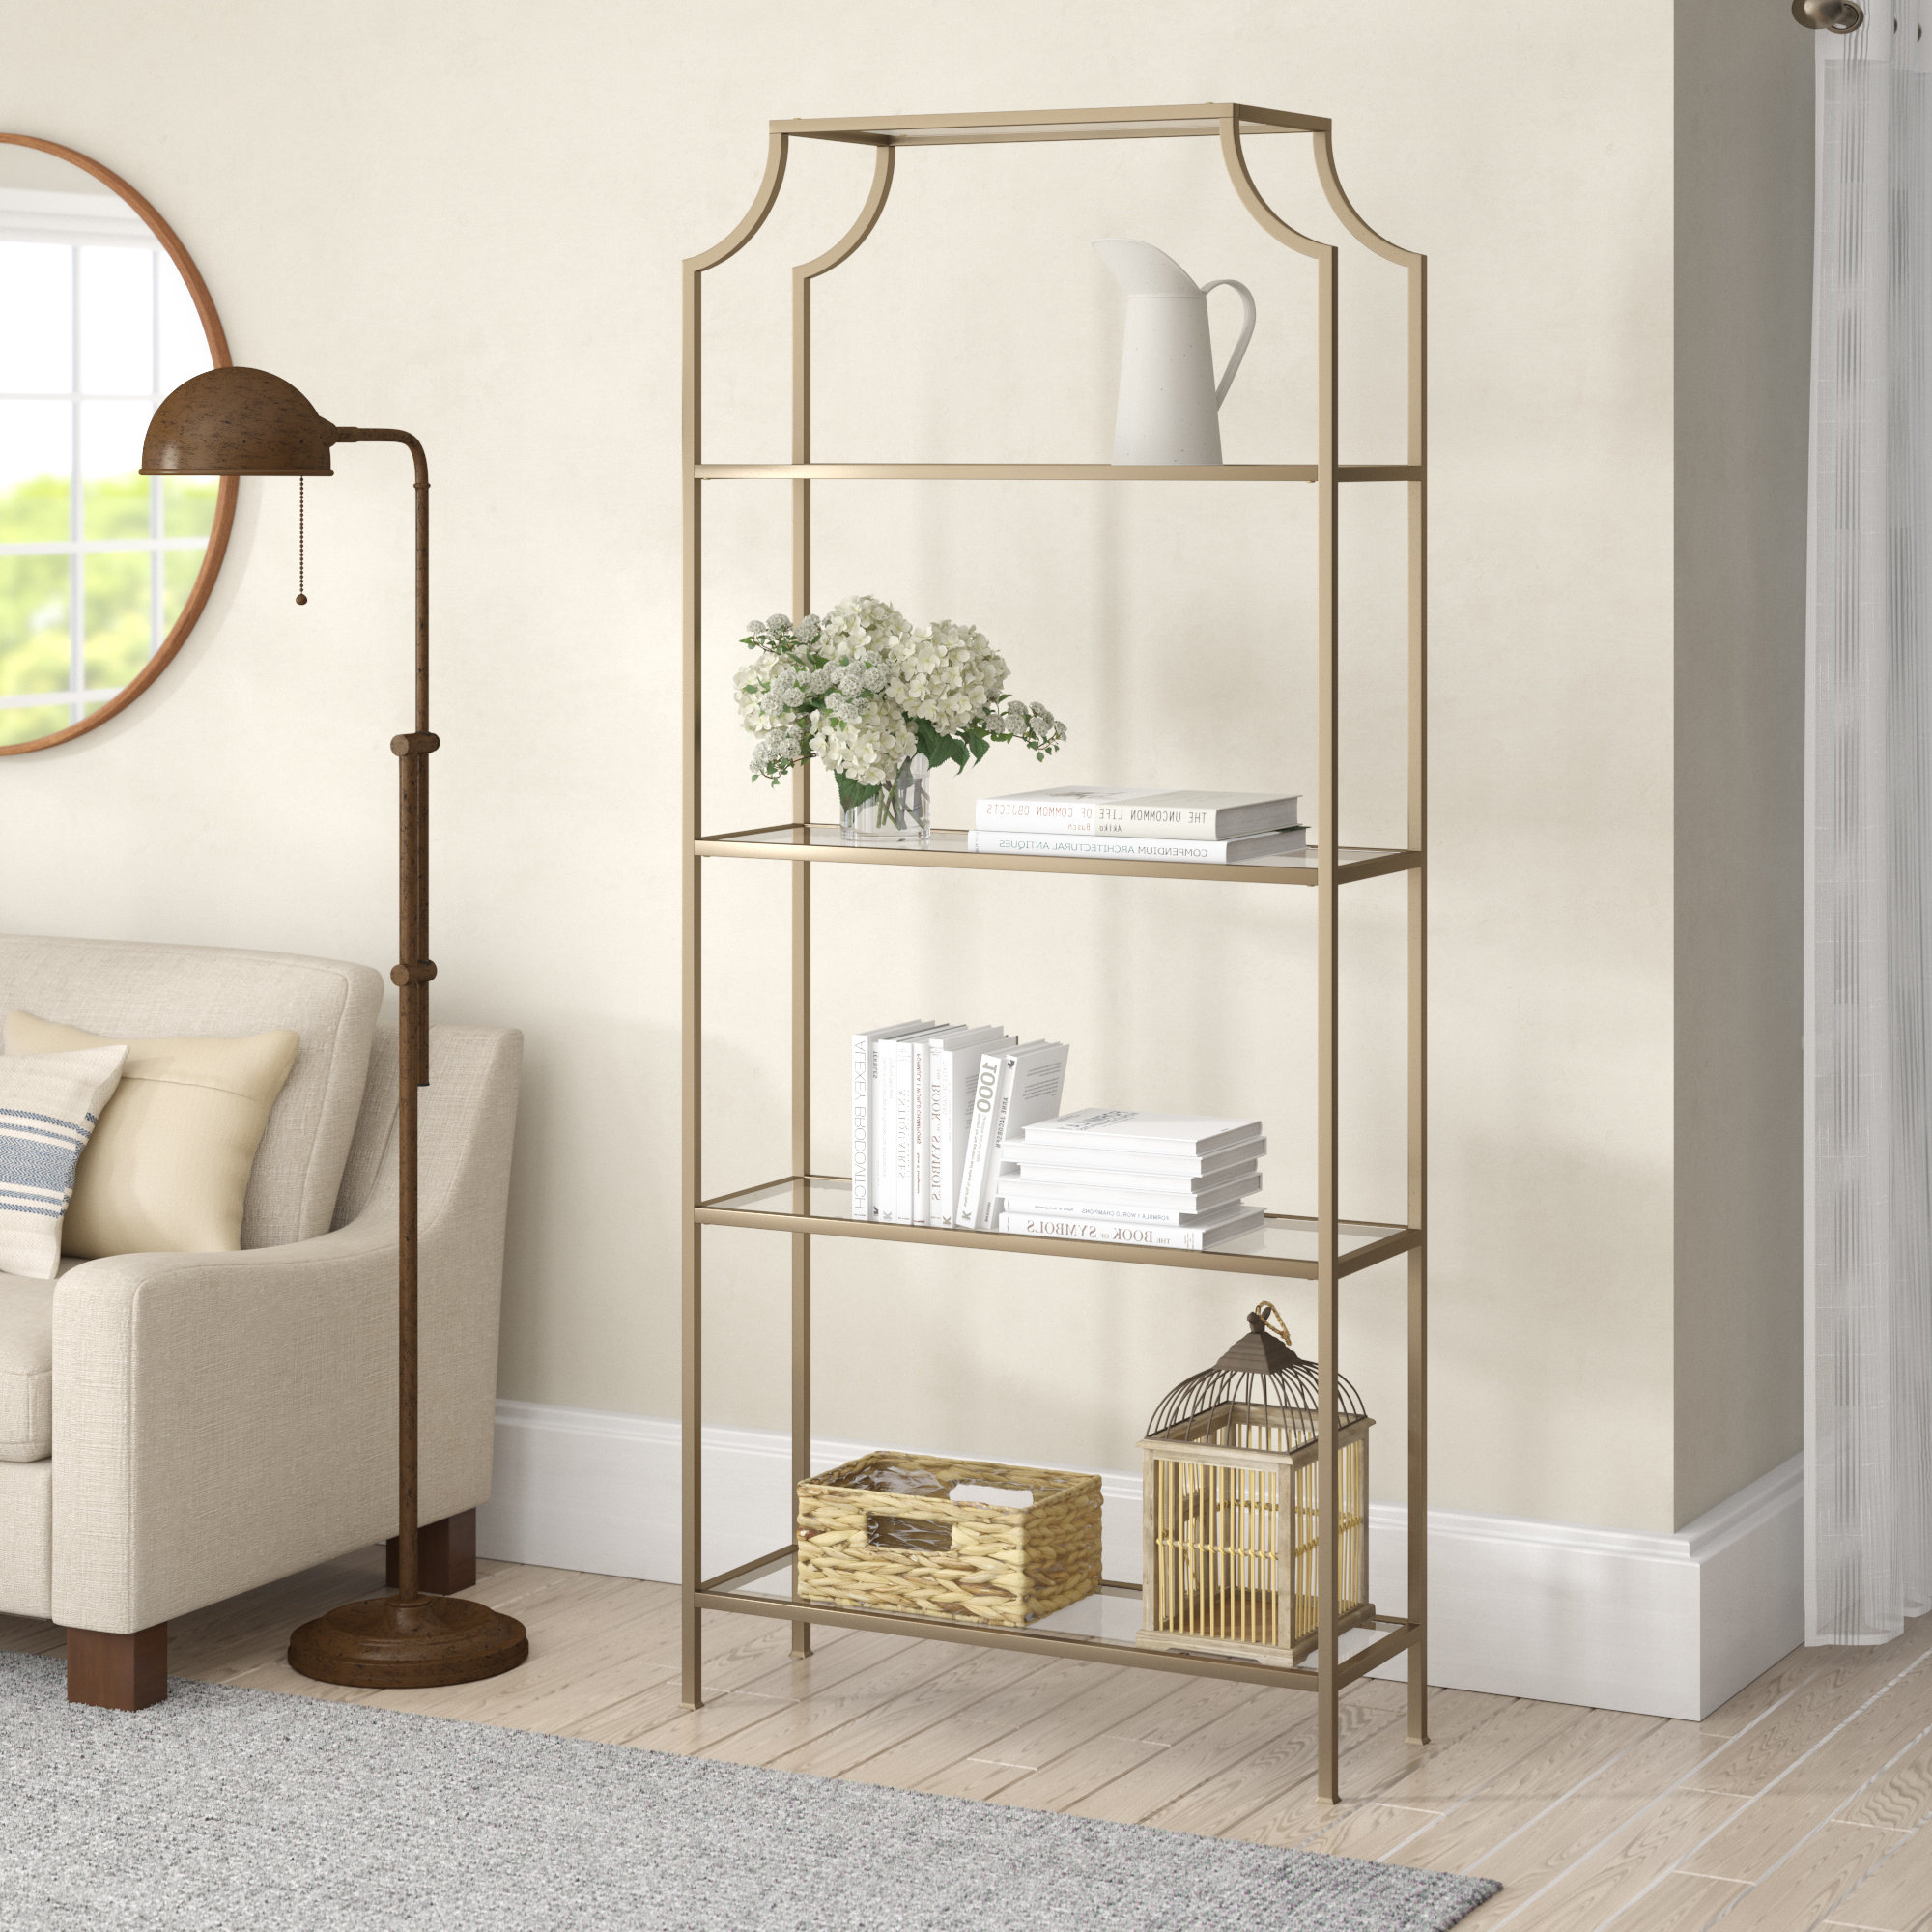 Fashionable Buchanan Etagere Bookcase (View 11 of 20)